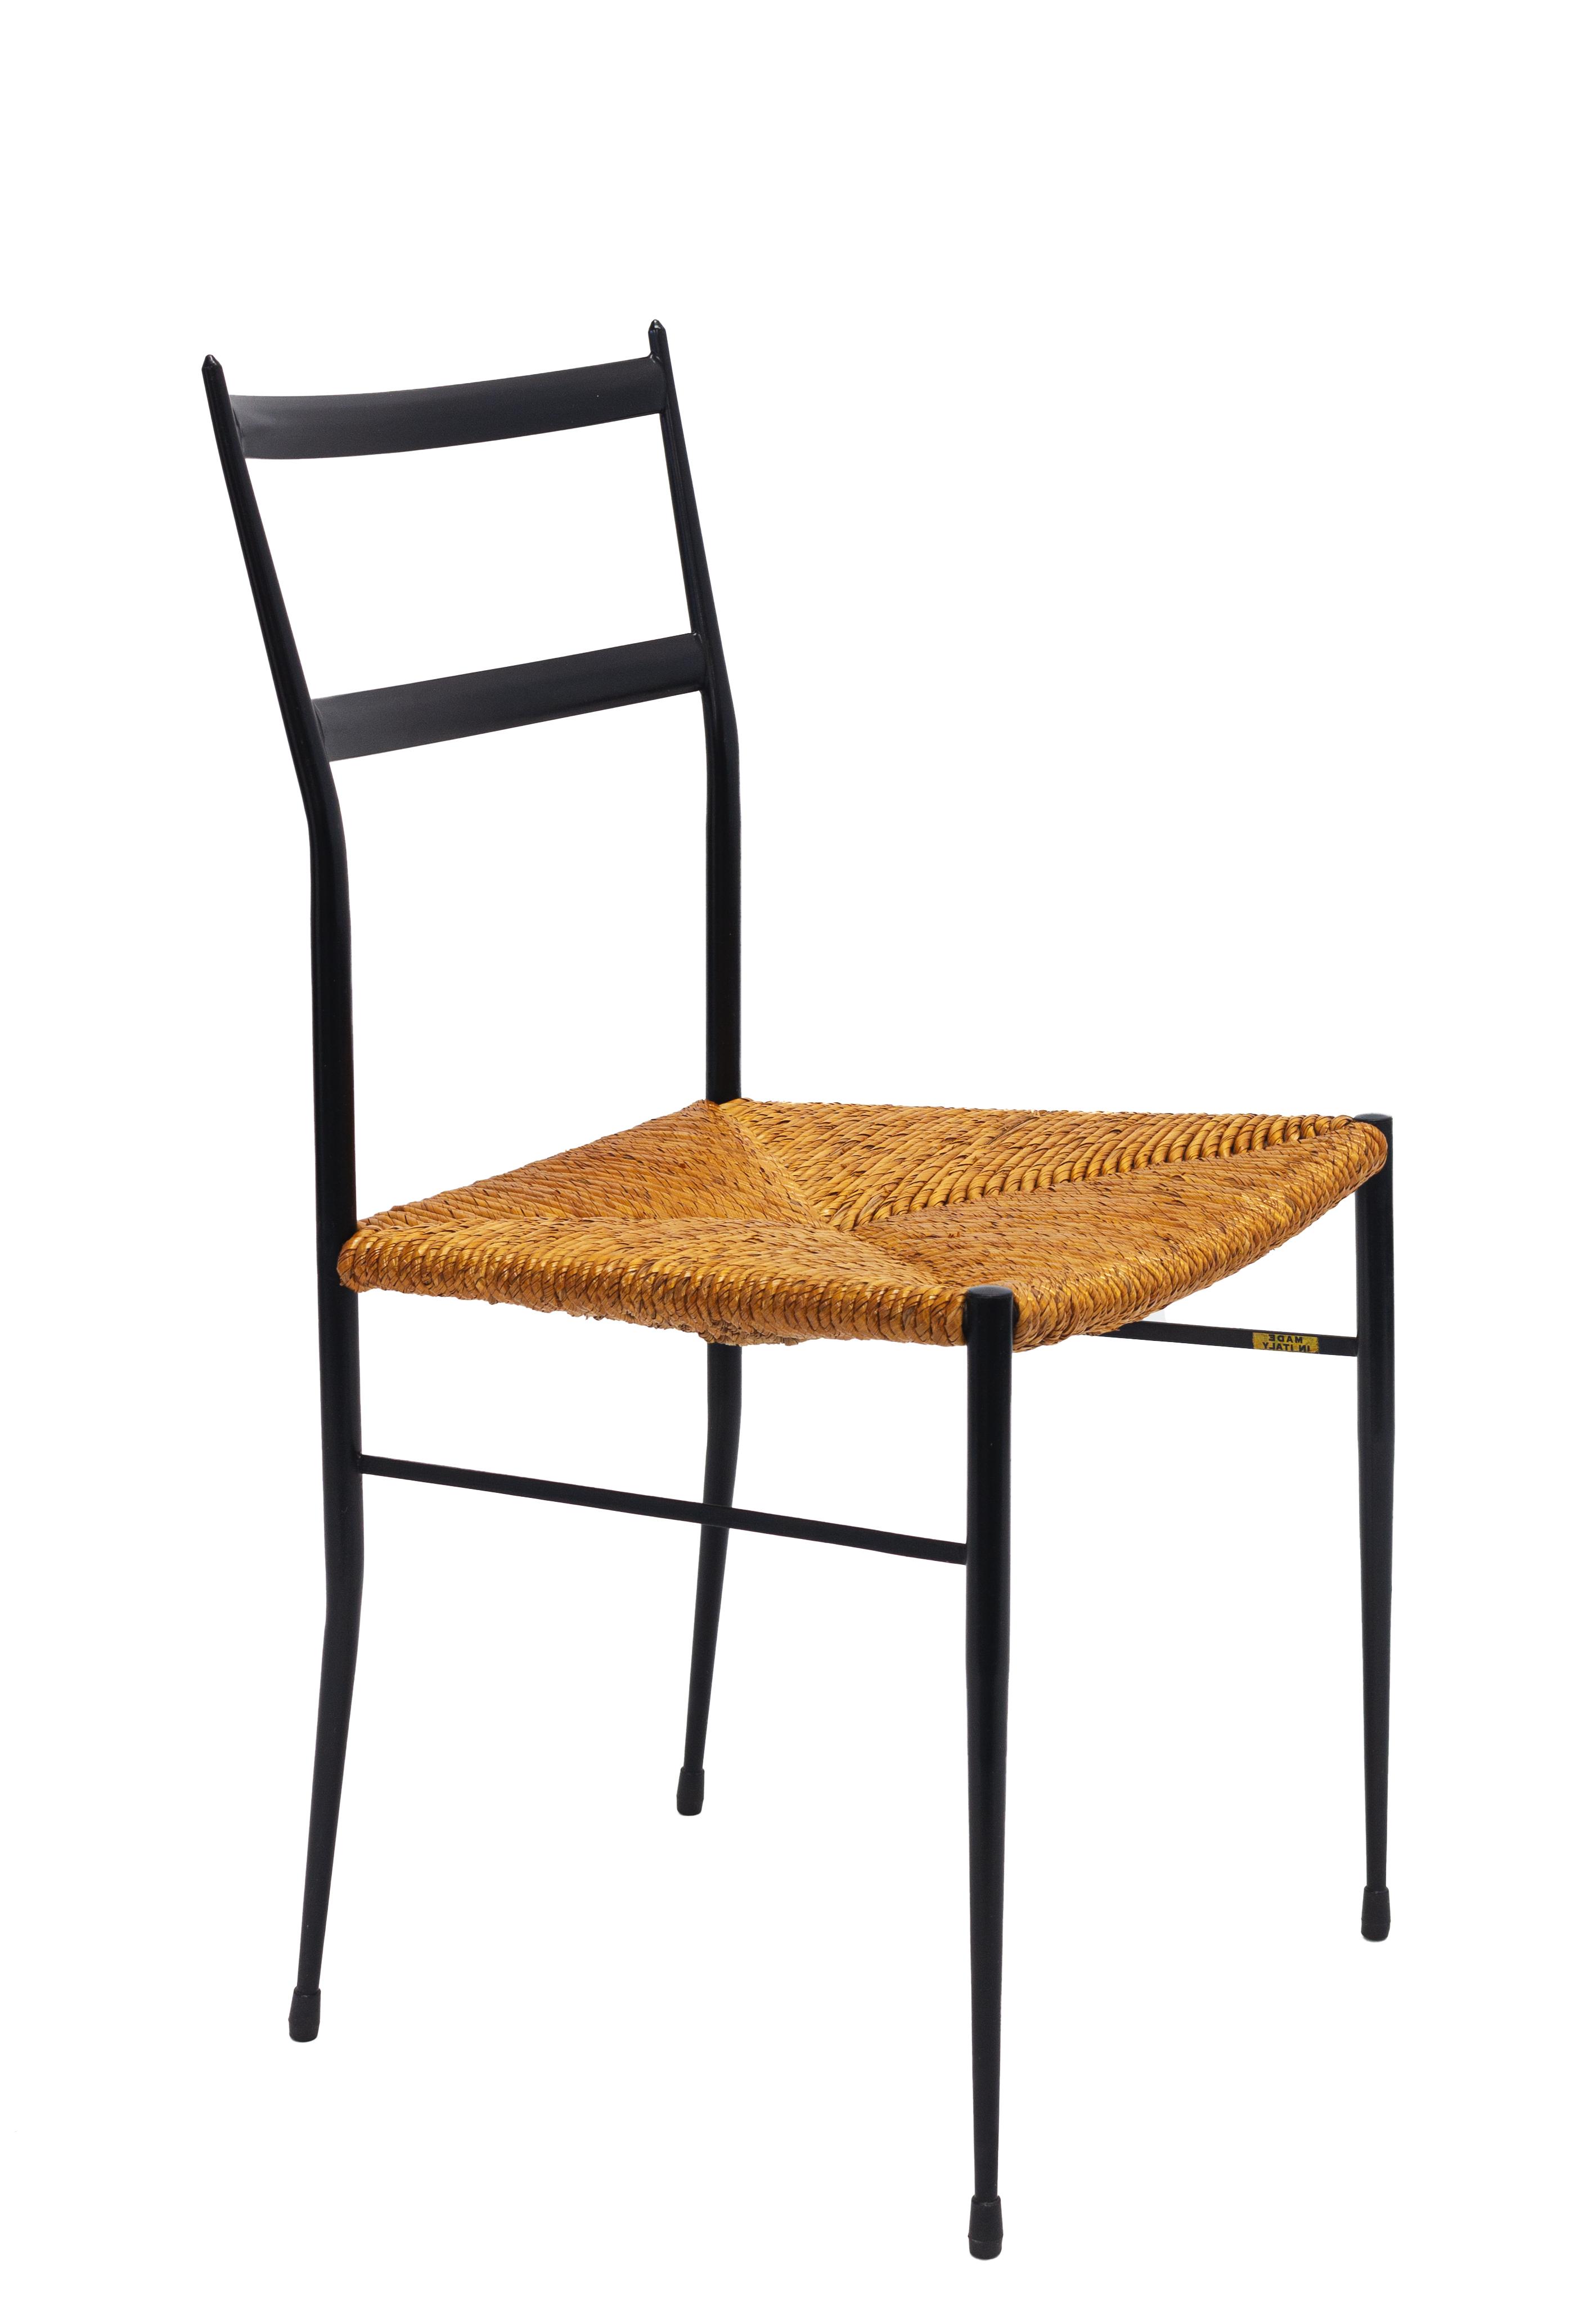 Pair of Mid Century Metal Superleggera Chairs, Attributed to Gio Ponti.